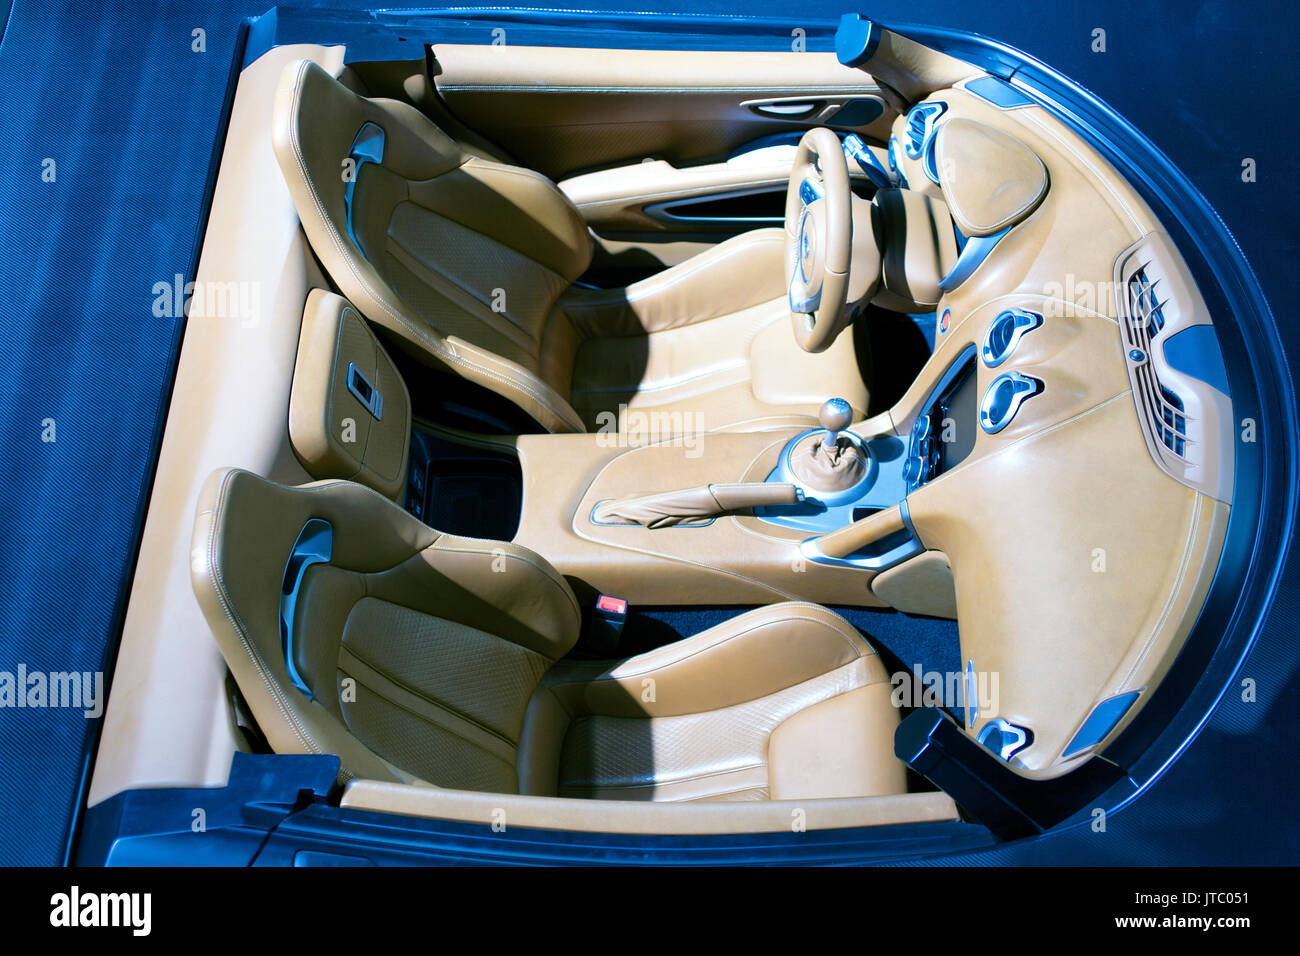 A luxury car interior Stock Photo